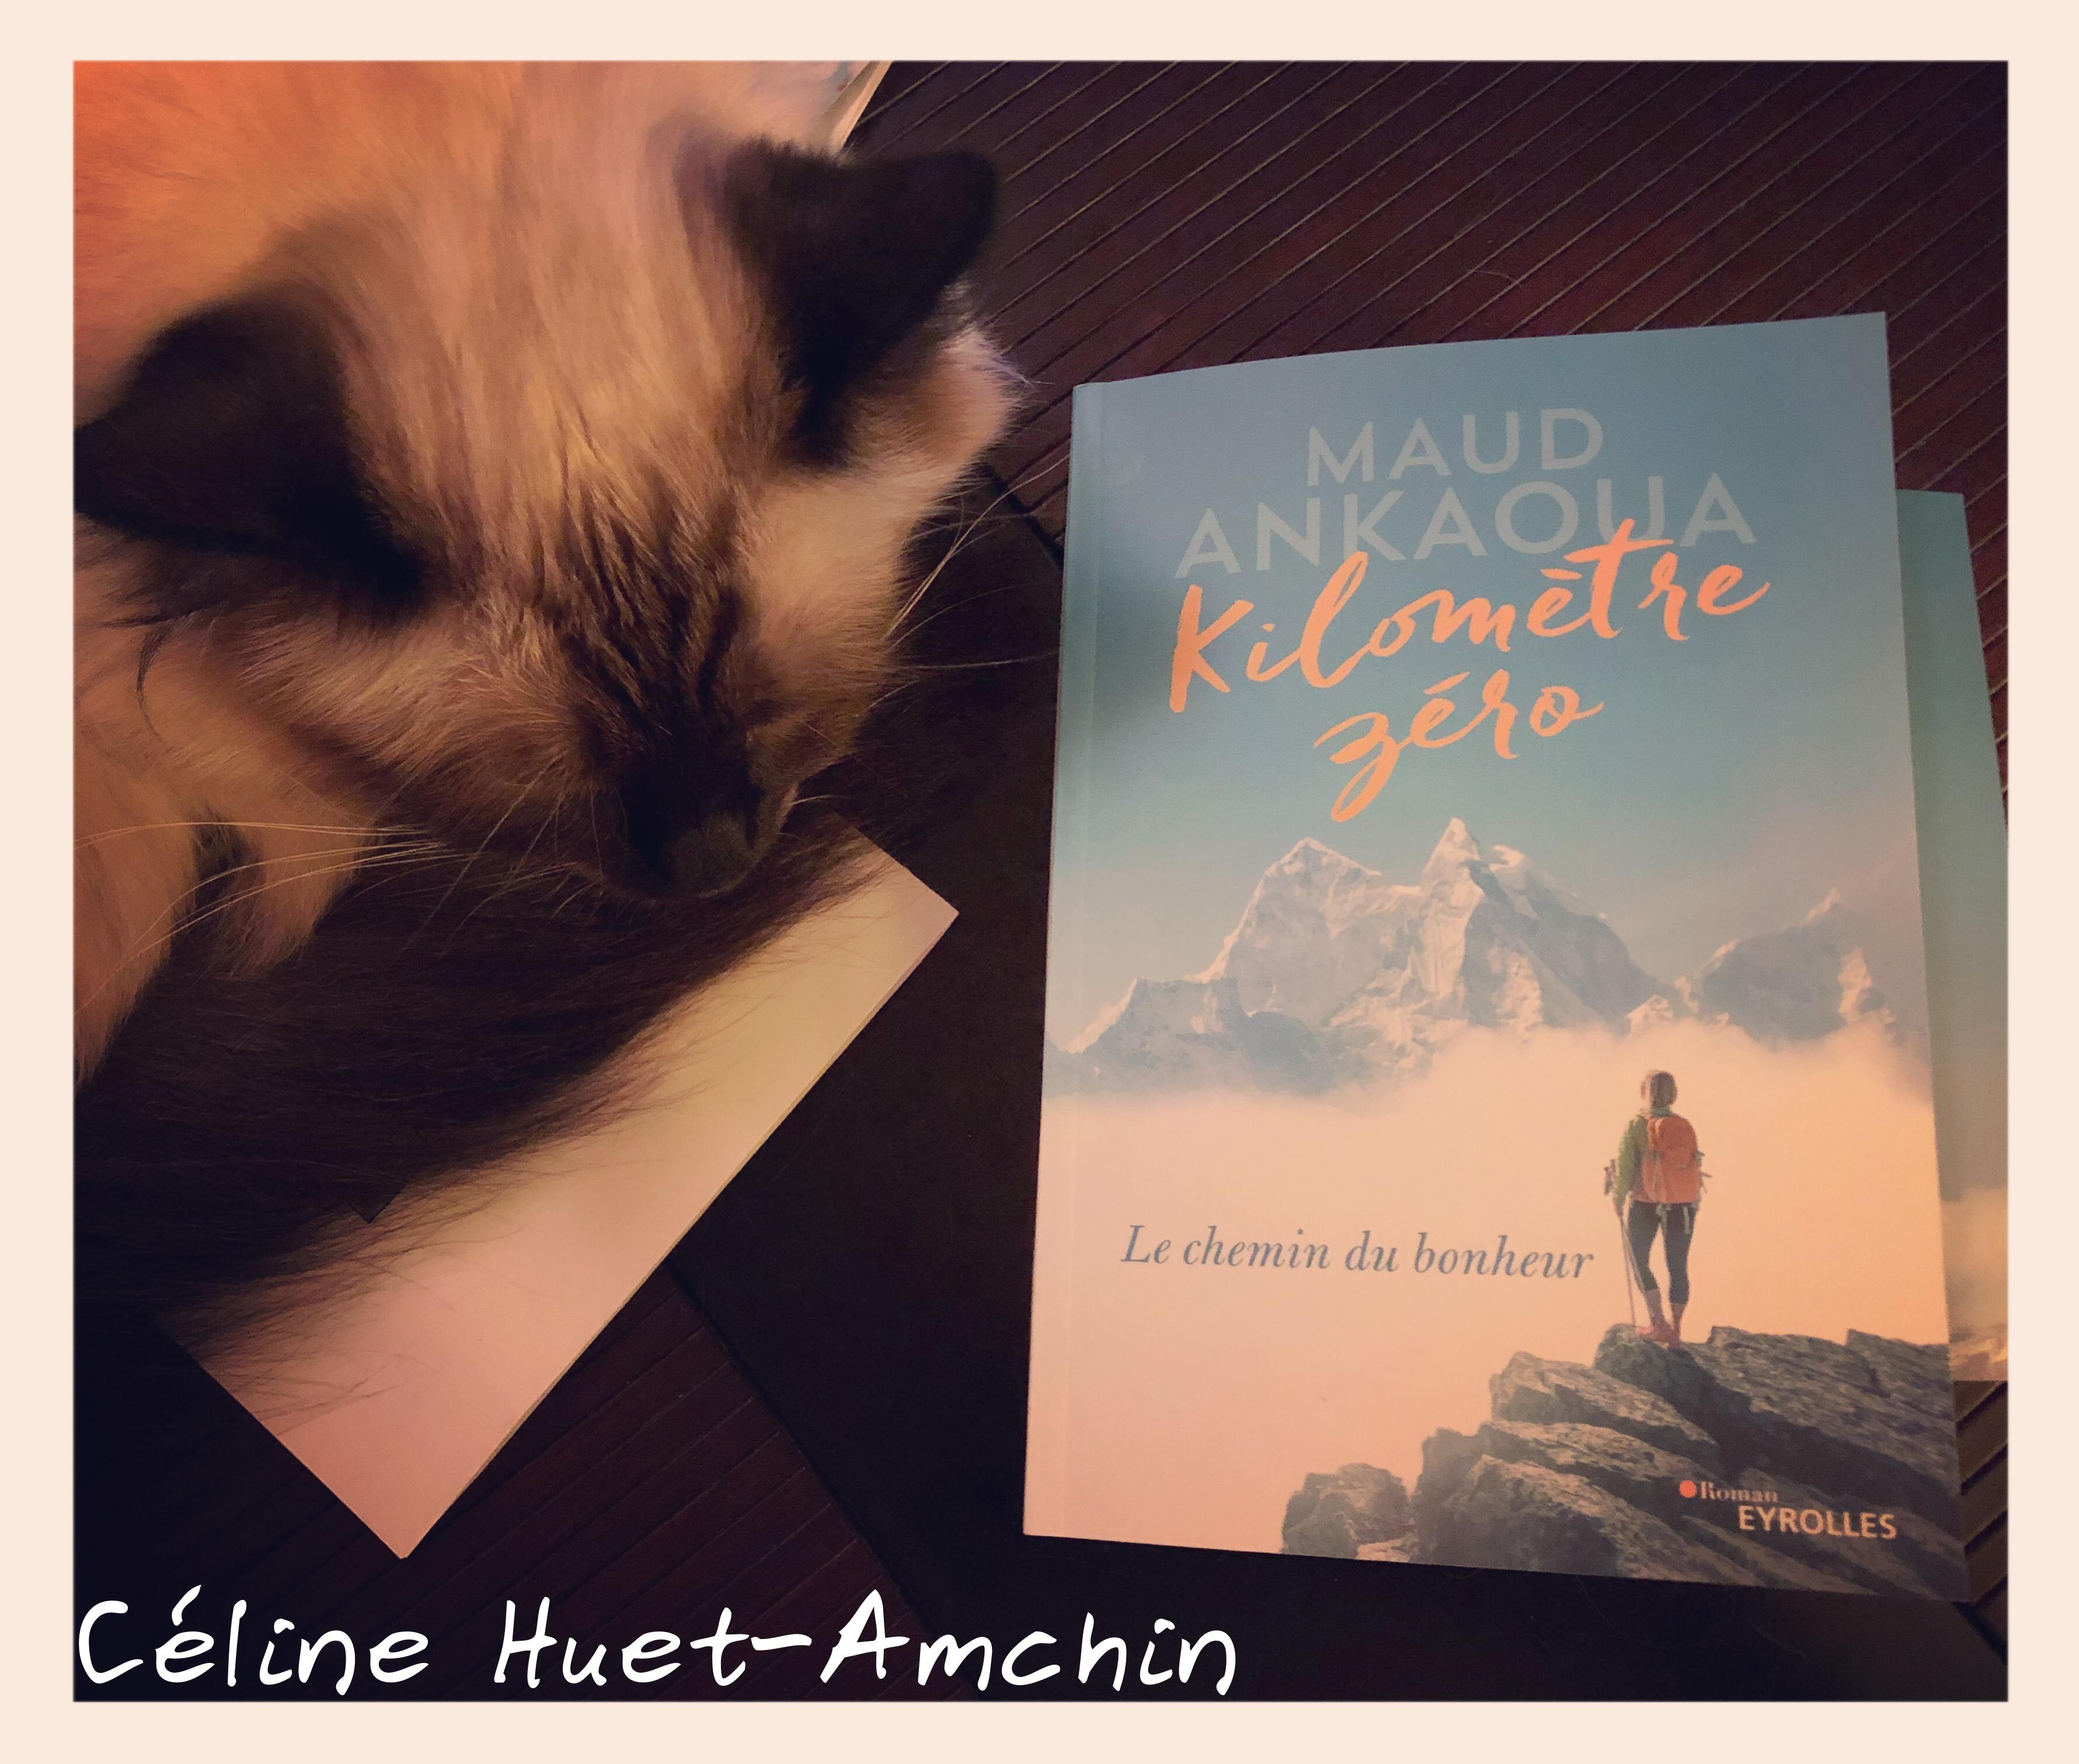 Kilomètre zéro le chemin du bonheur Maud Ankaoua Editions Eyrolles